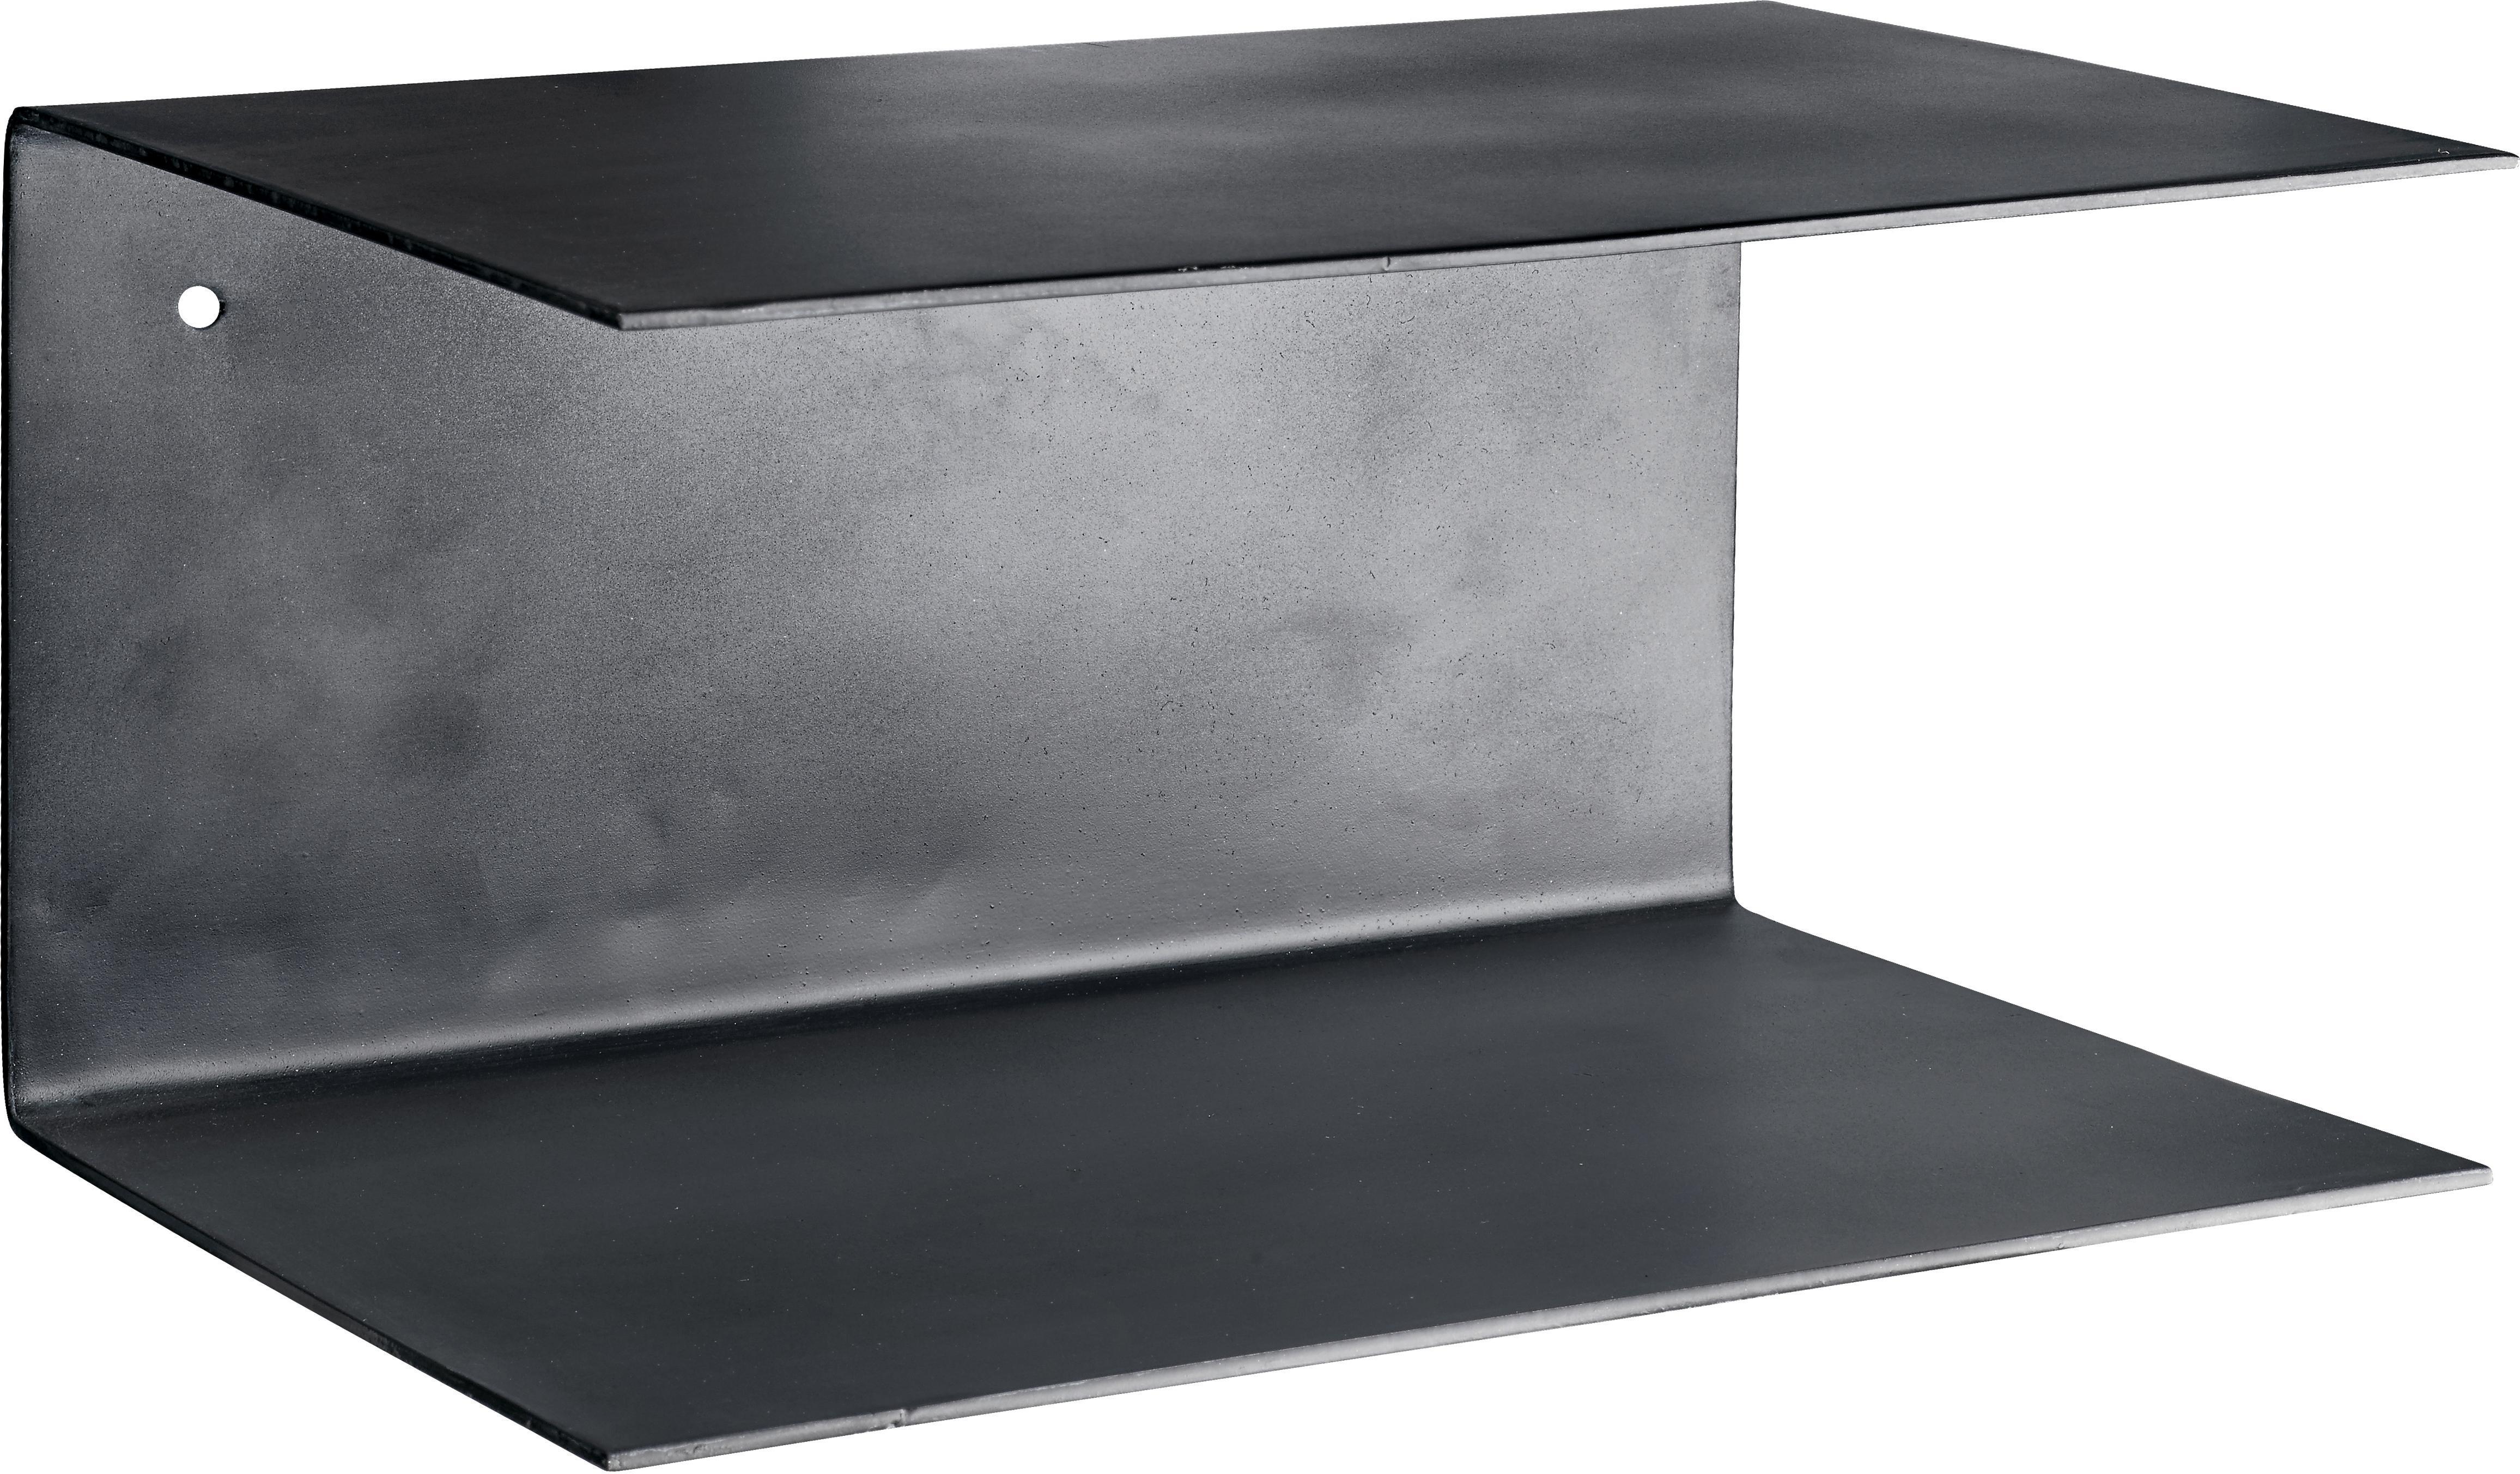 Mensola a muro in metallo Phantom 2 pz, Metallo verniciato, Nero, Larg. 30 x Alt. 15 cm